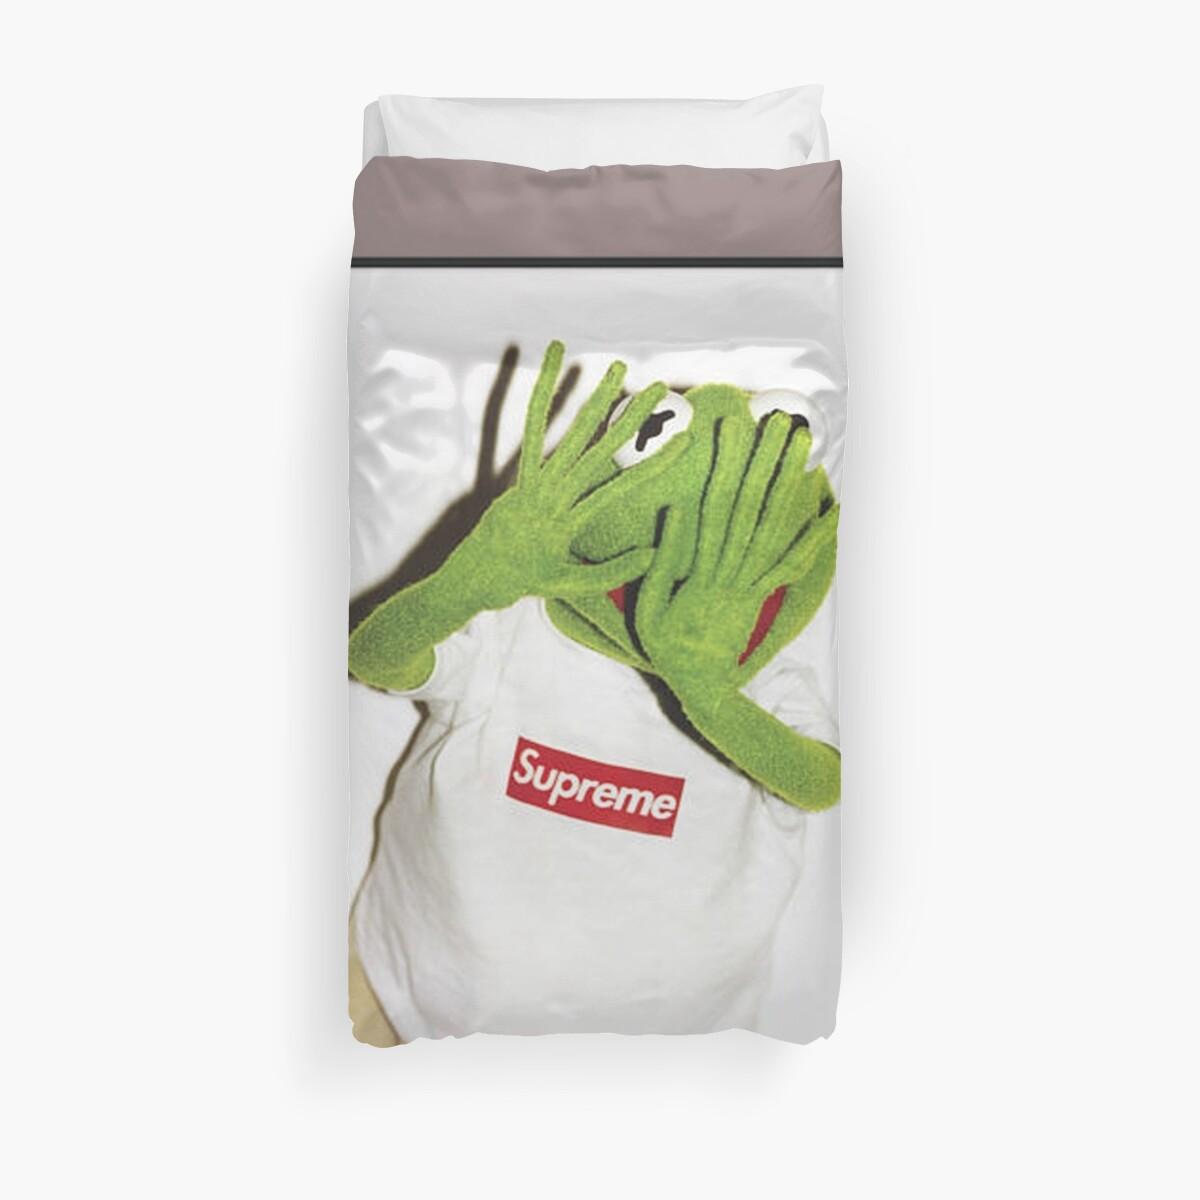 Kermit hates Paparazzi Duvet Cover